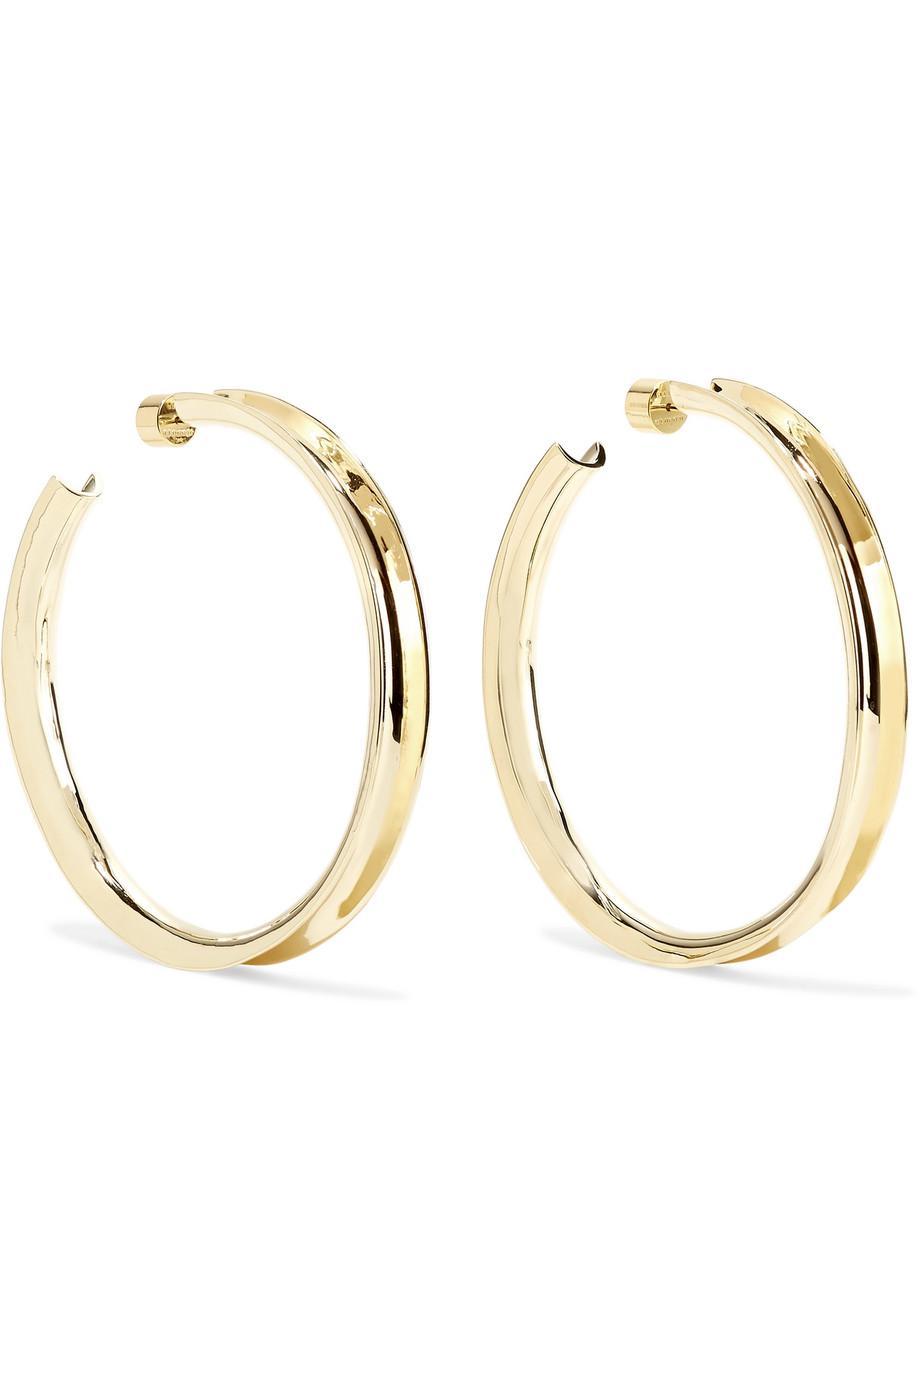 Jennifer Fisher Reverse Gold-plated Hoop Earrings rq0Enlx